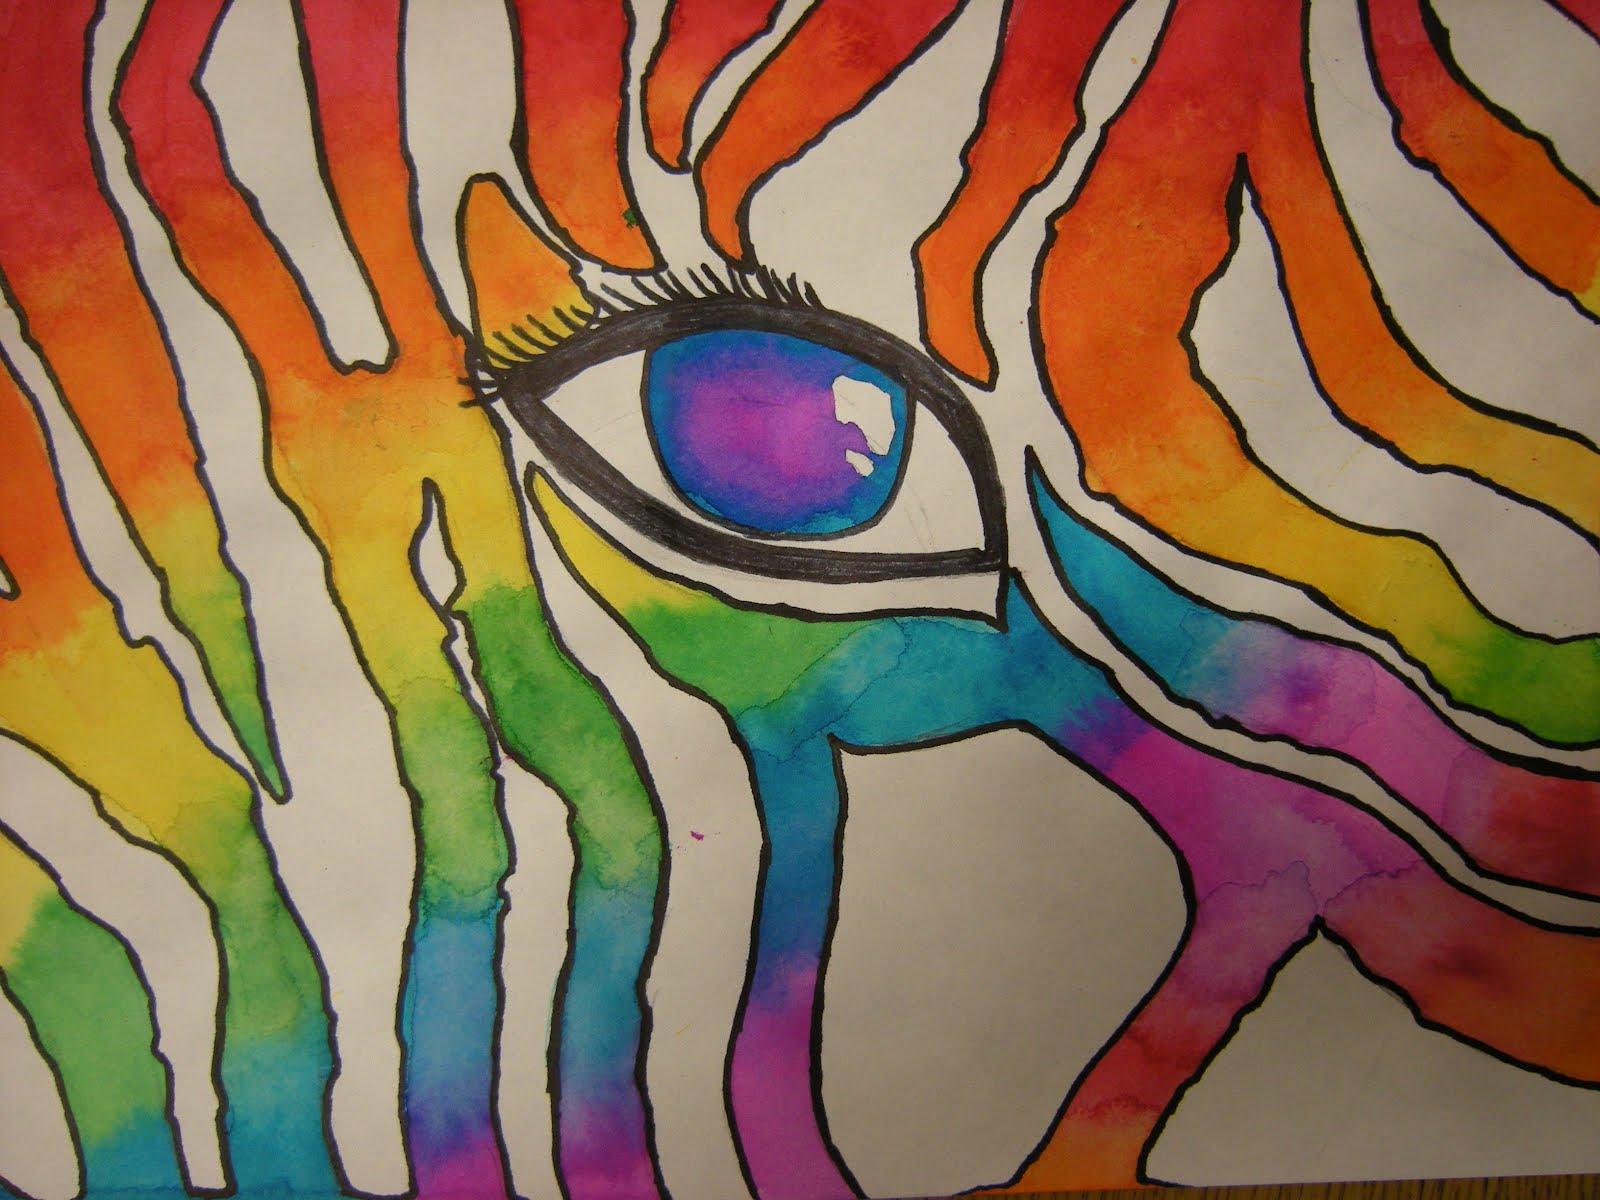 Color wheel art projects for kids - Color Wheel Zebra Eye